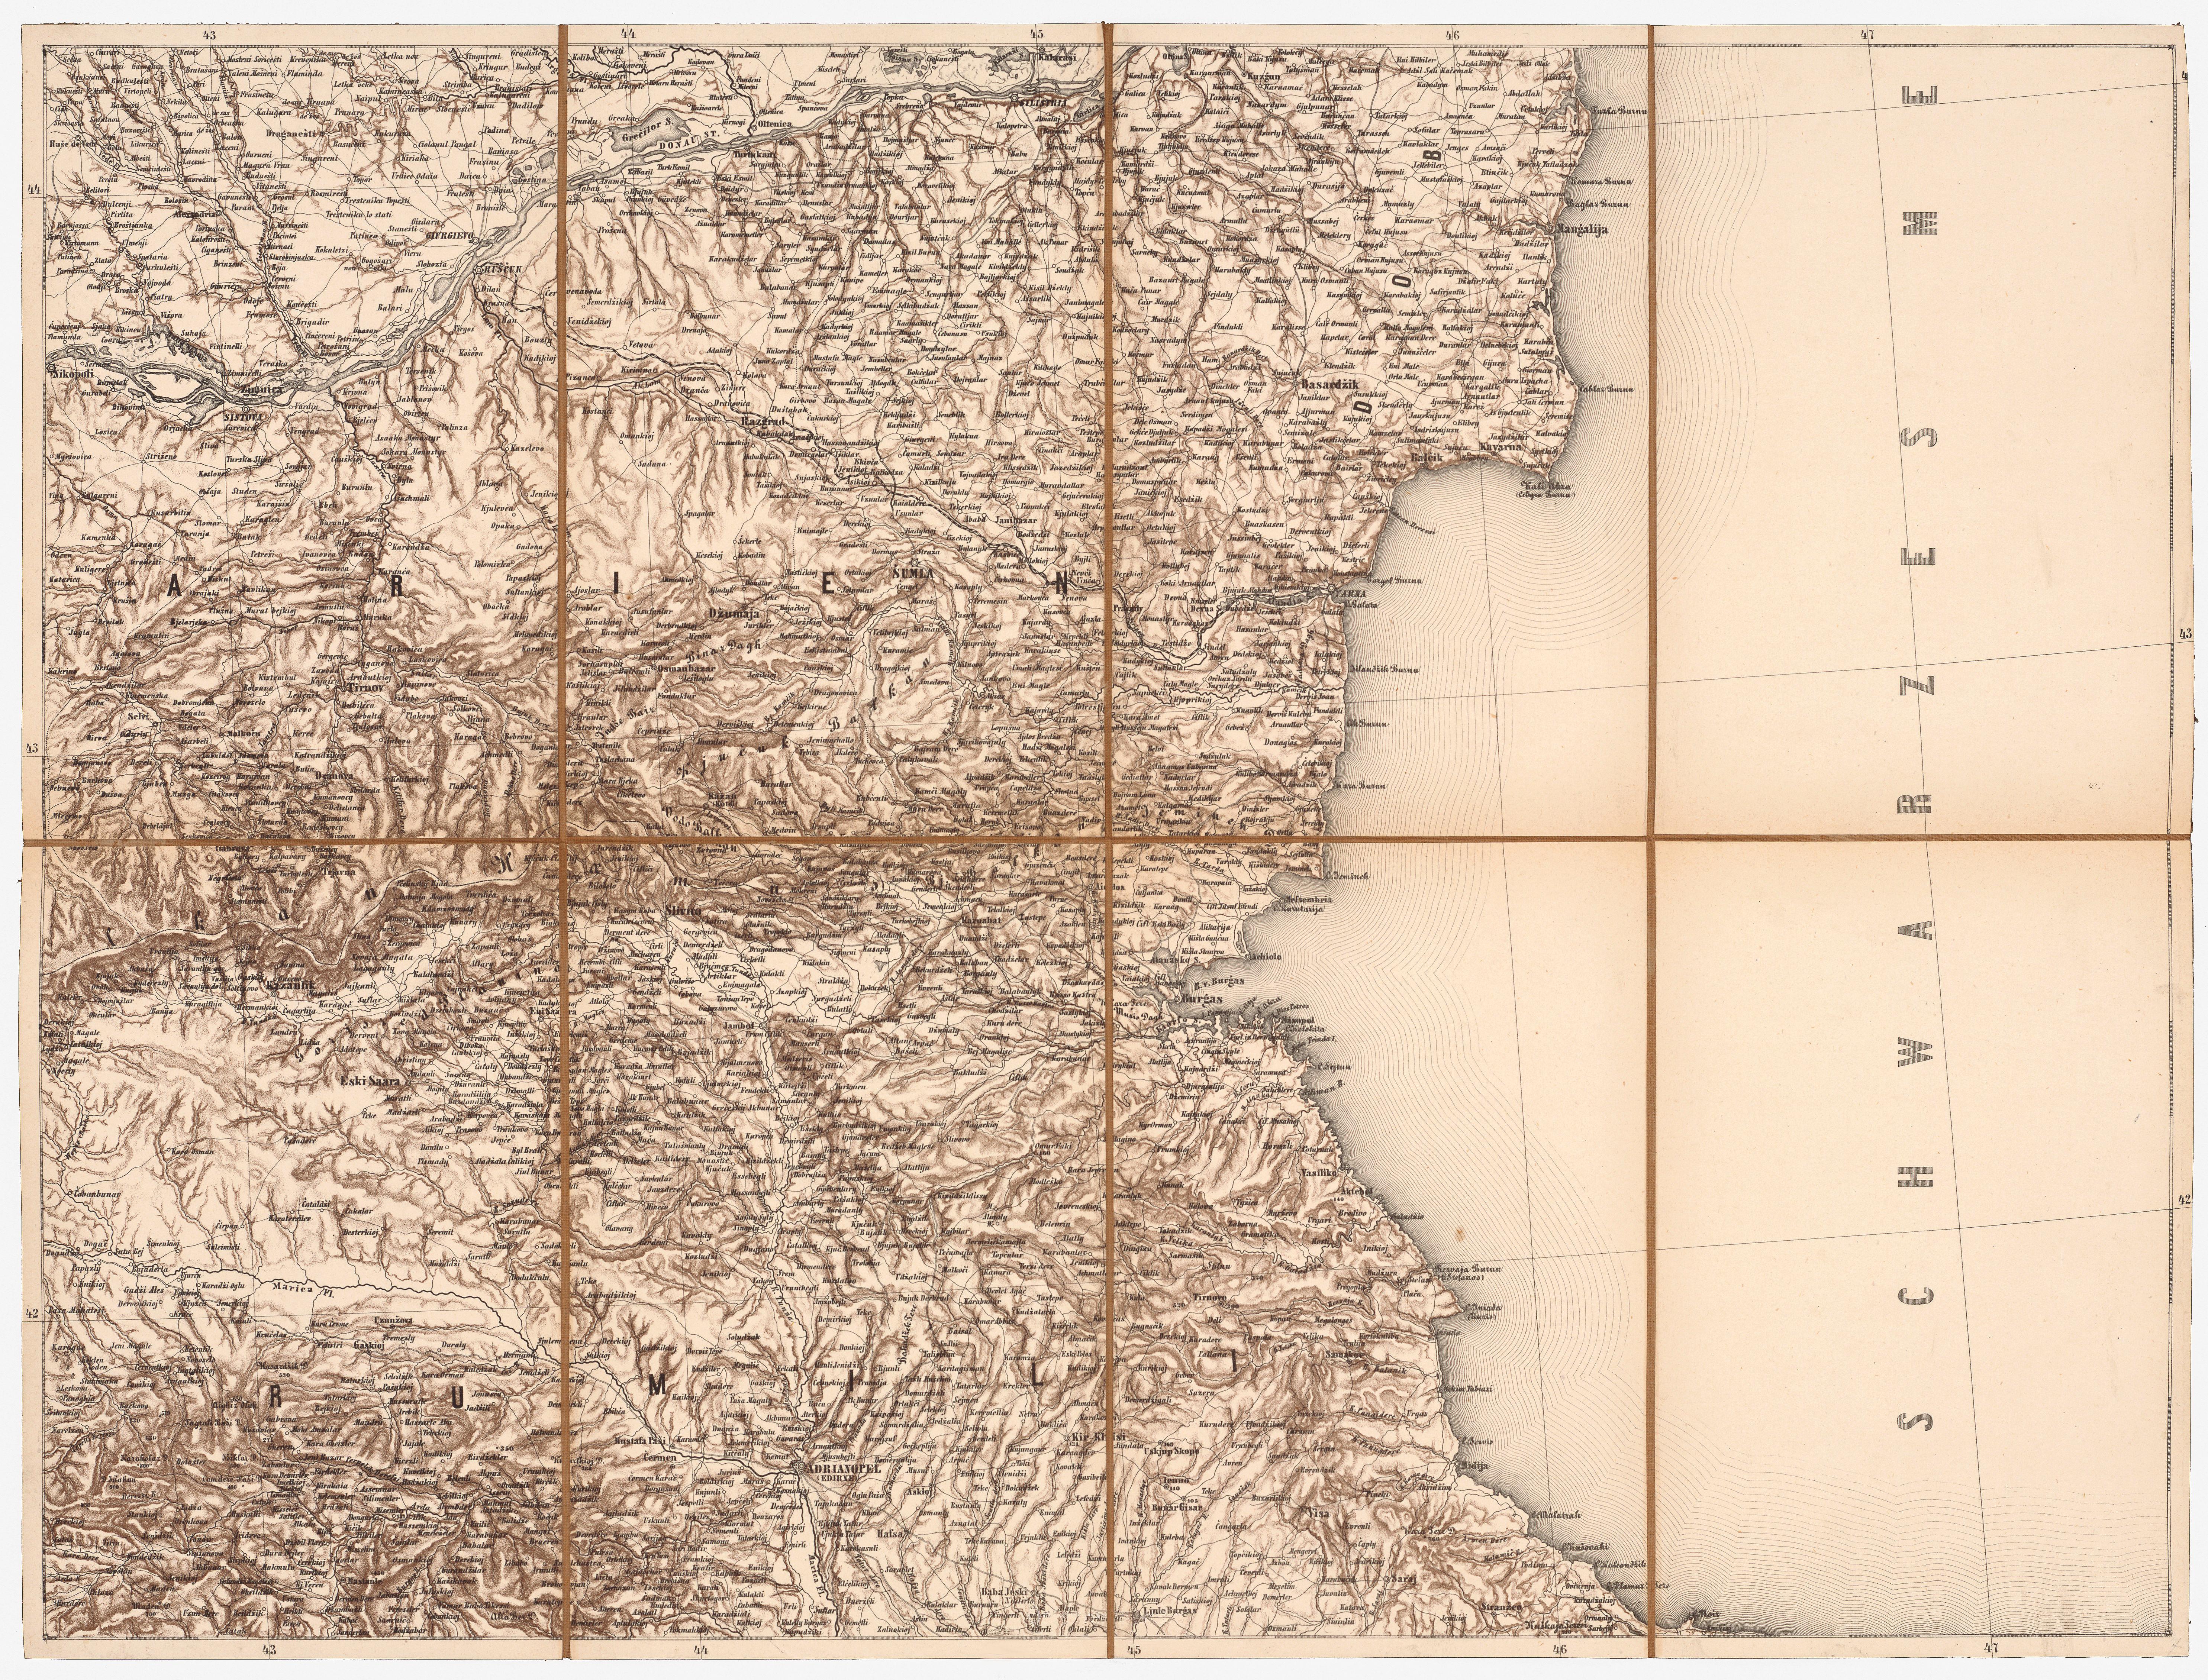 Karte Bulgarien.File 6 Mittl Bulgarien Schwarzmeerkuste Scheda Karte